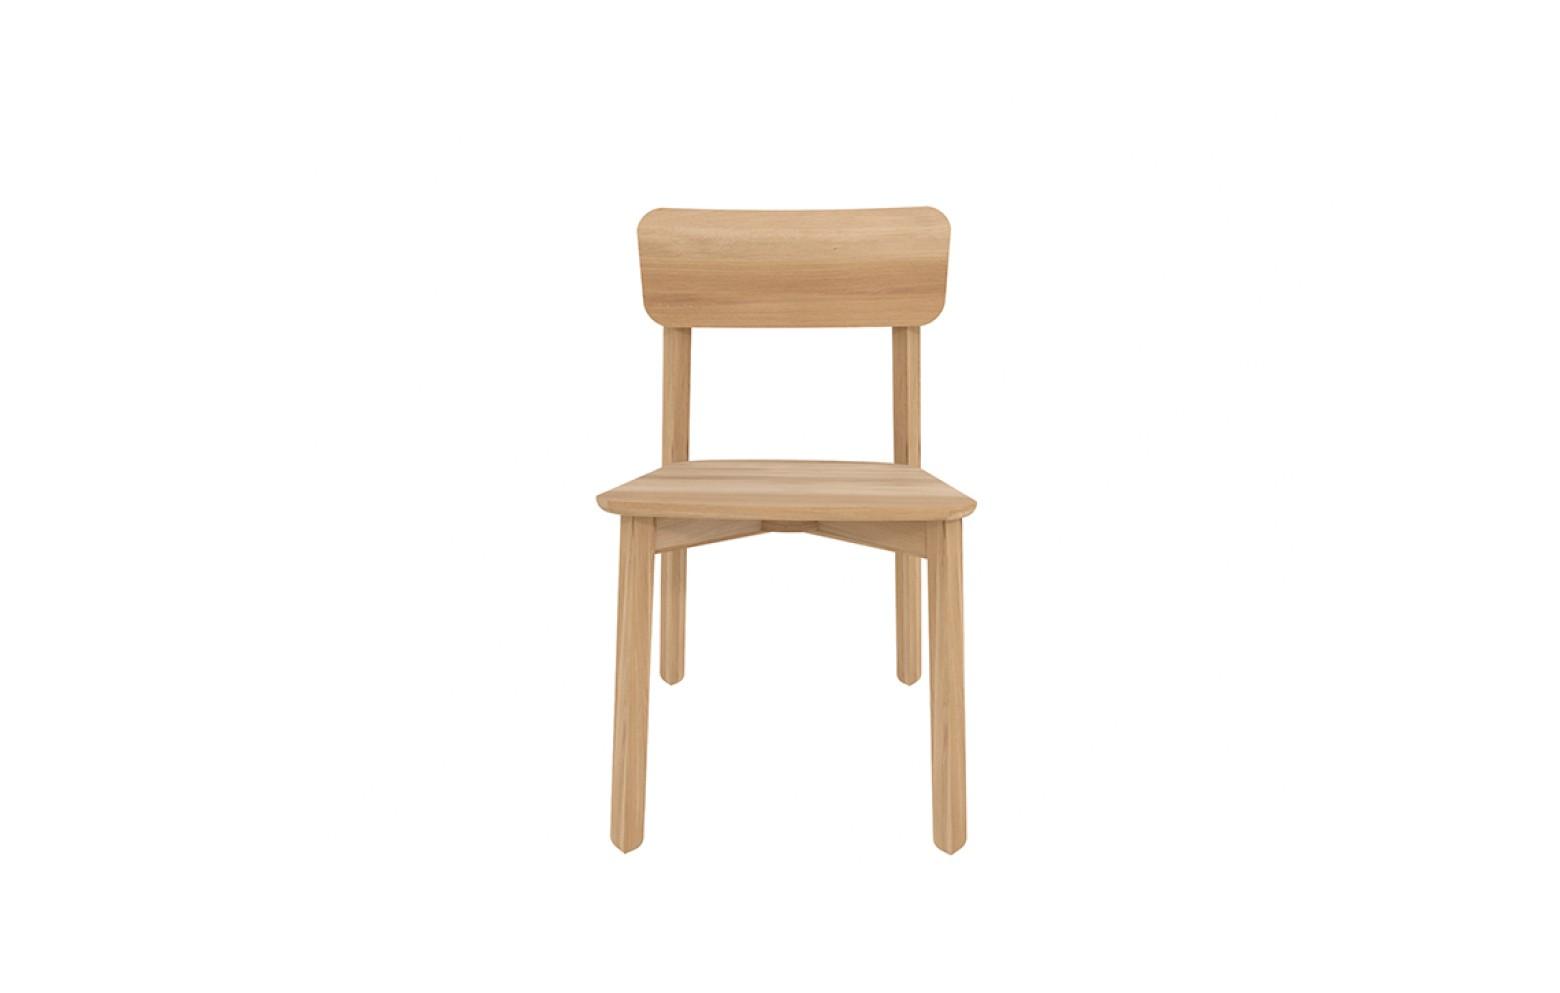 oak casale st hle tische st hle who 39 s perfect. Black Bedroom Furniture Sets. Home Design Ideas